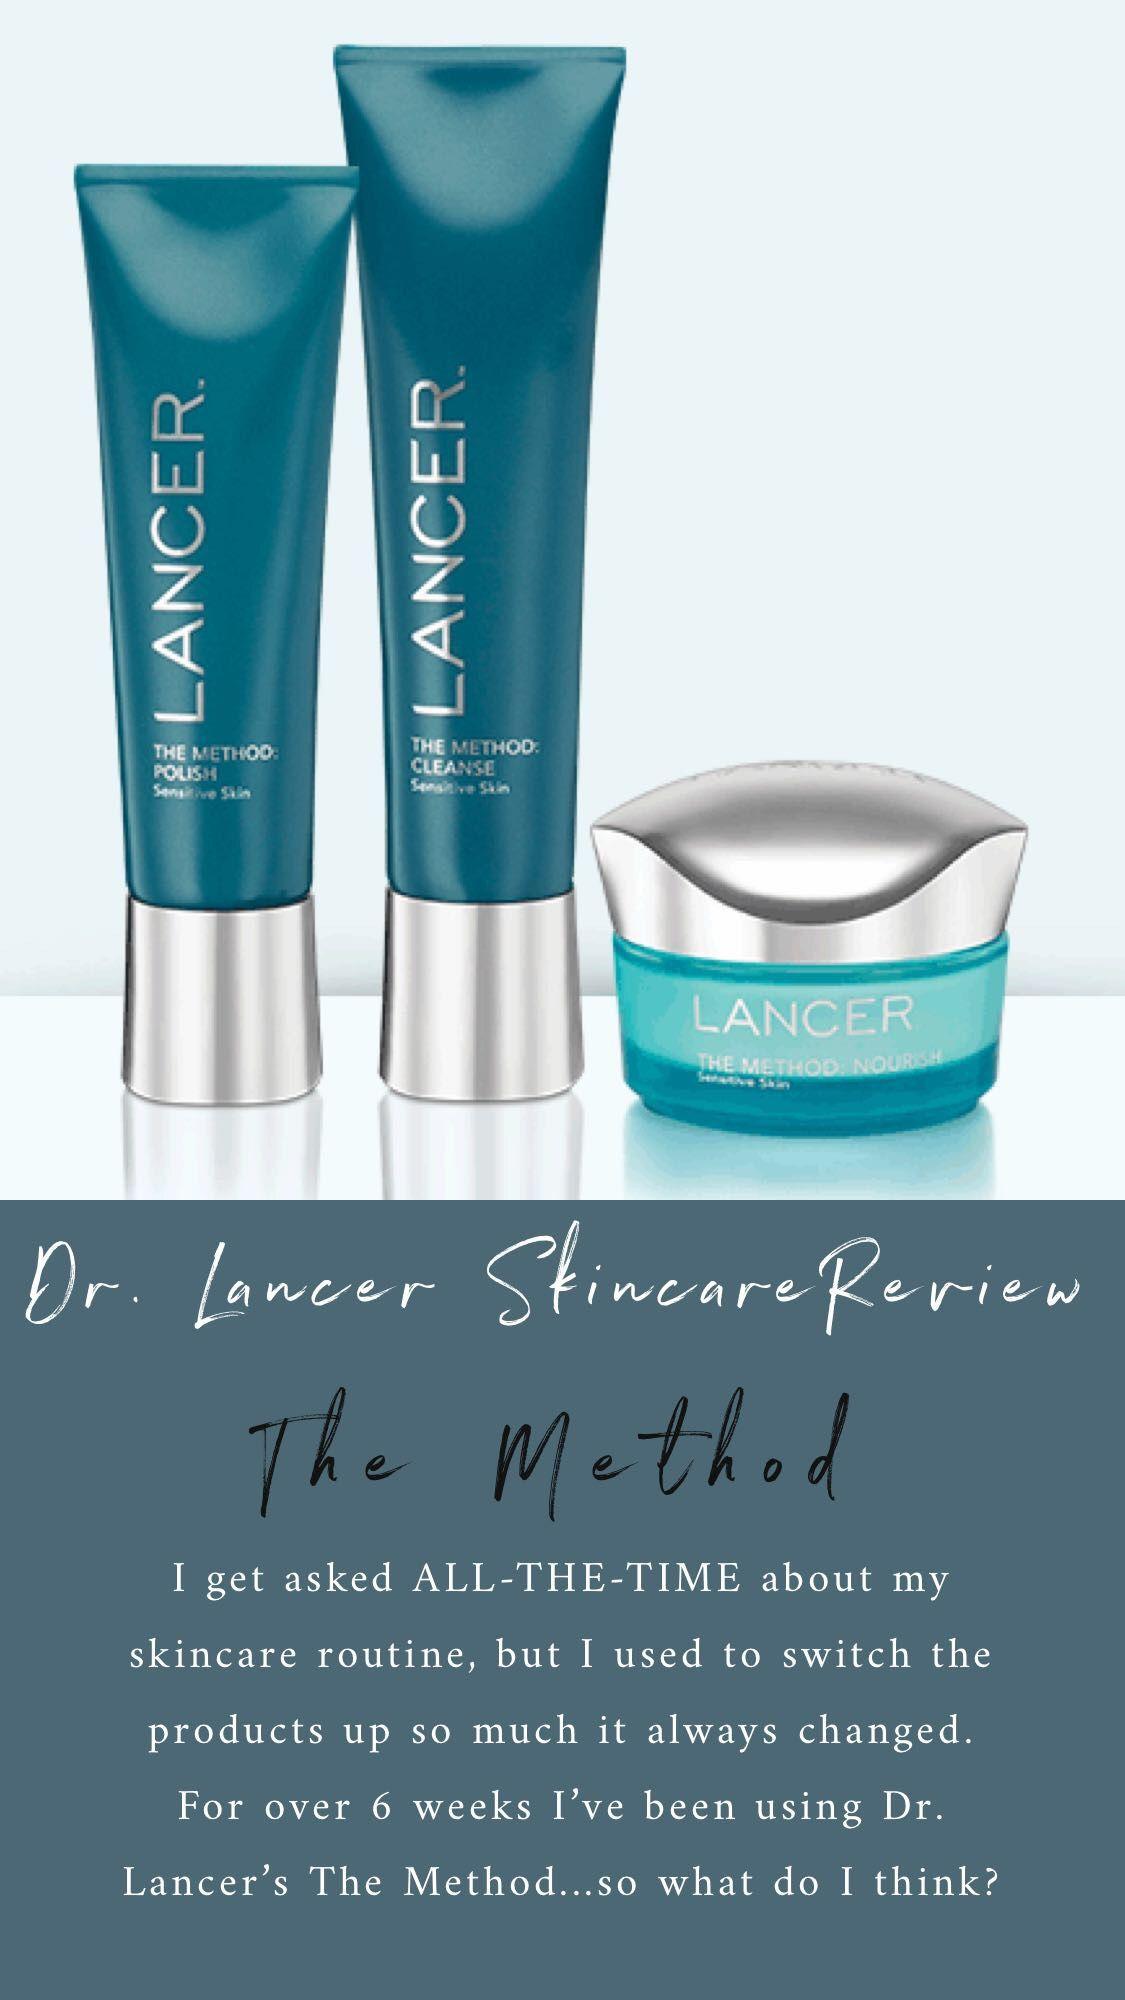 Lancer Skincare Reviews Dr Lancer The Method Polish The Method